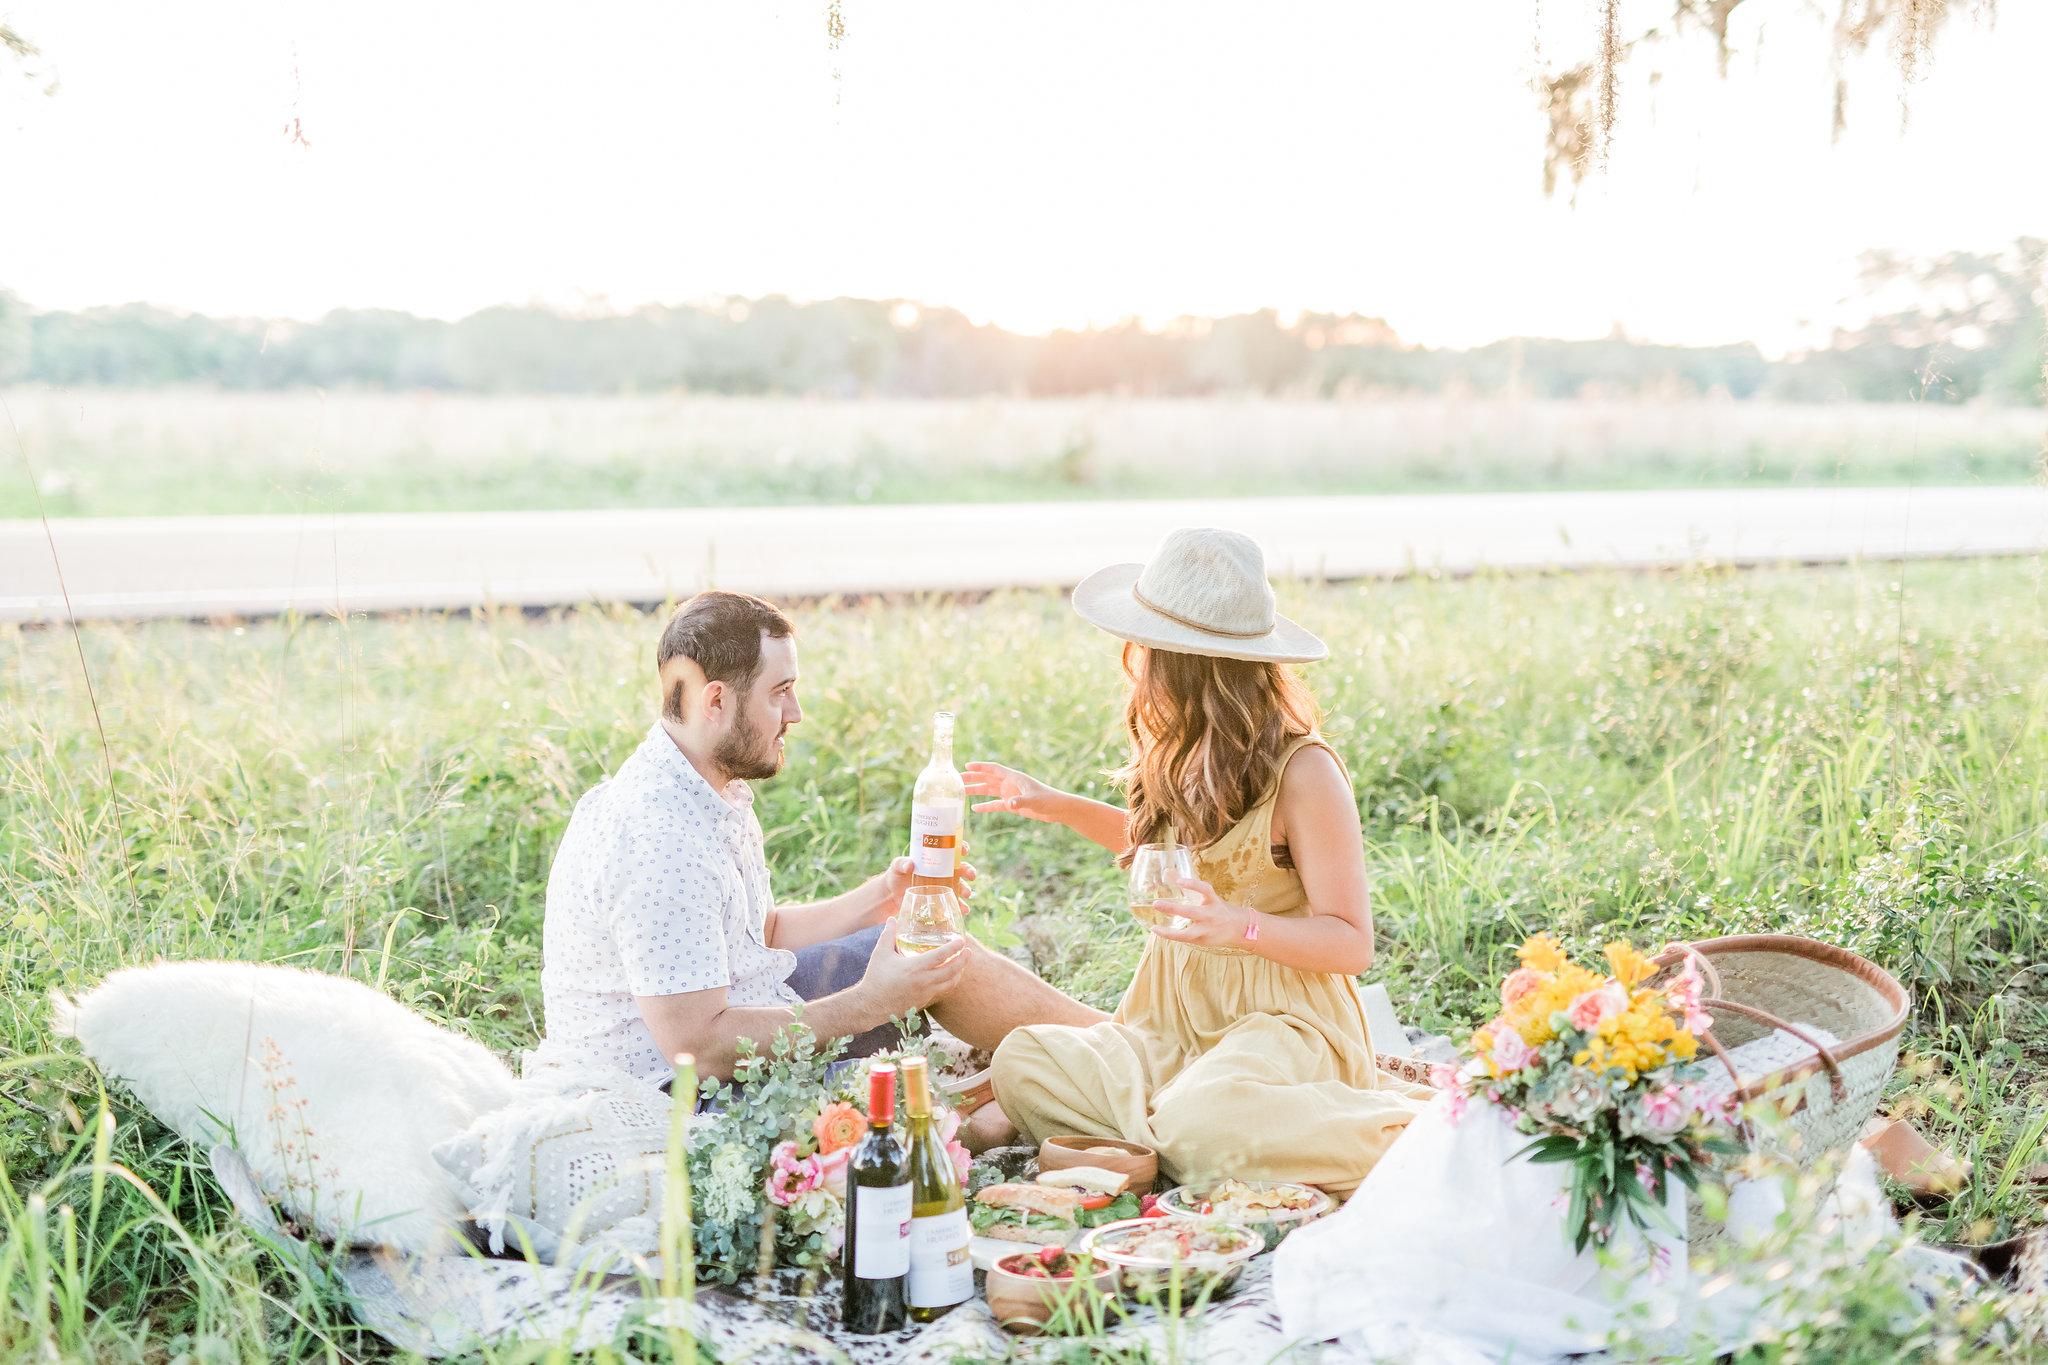 Cameron Hughes Wine Glamping Picnic Houston Spots Joyfullygreen